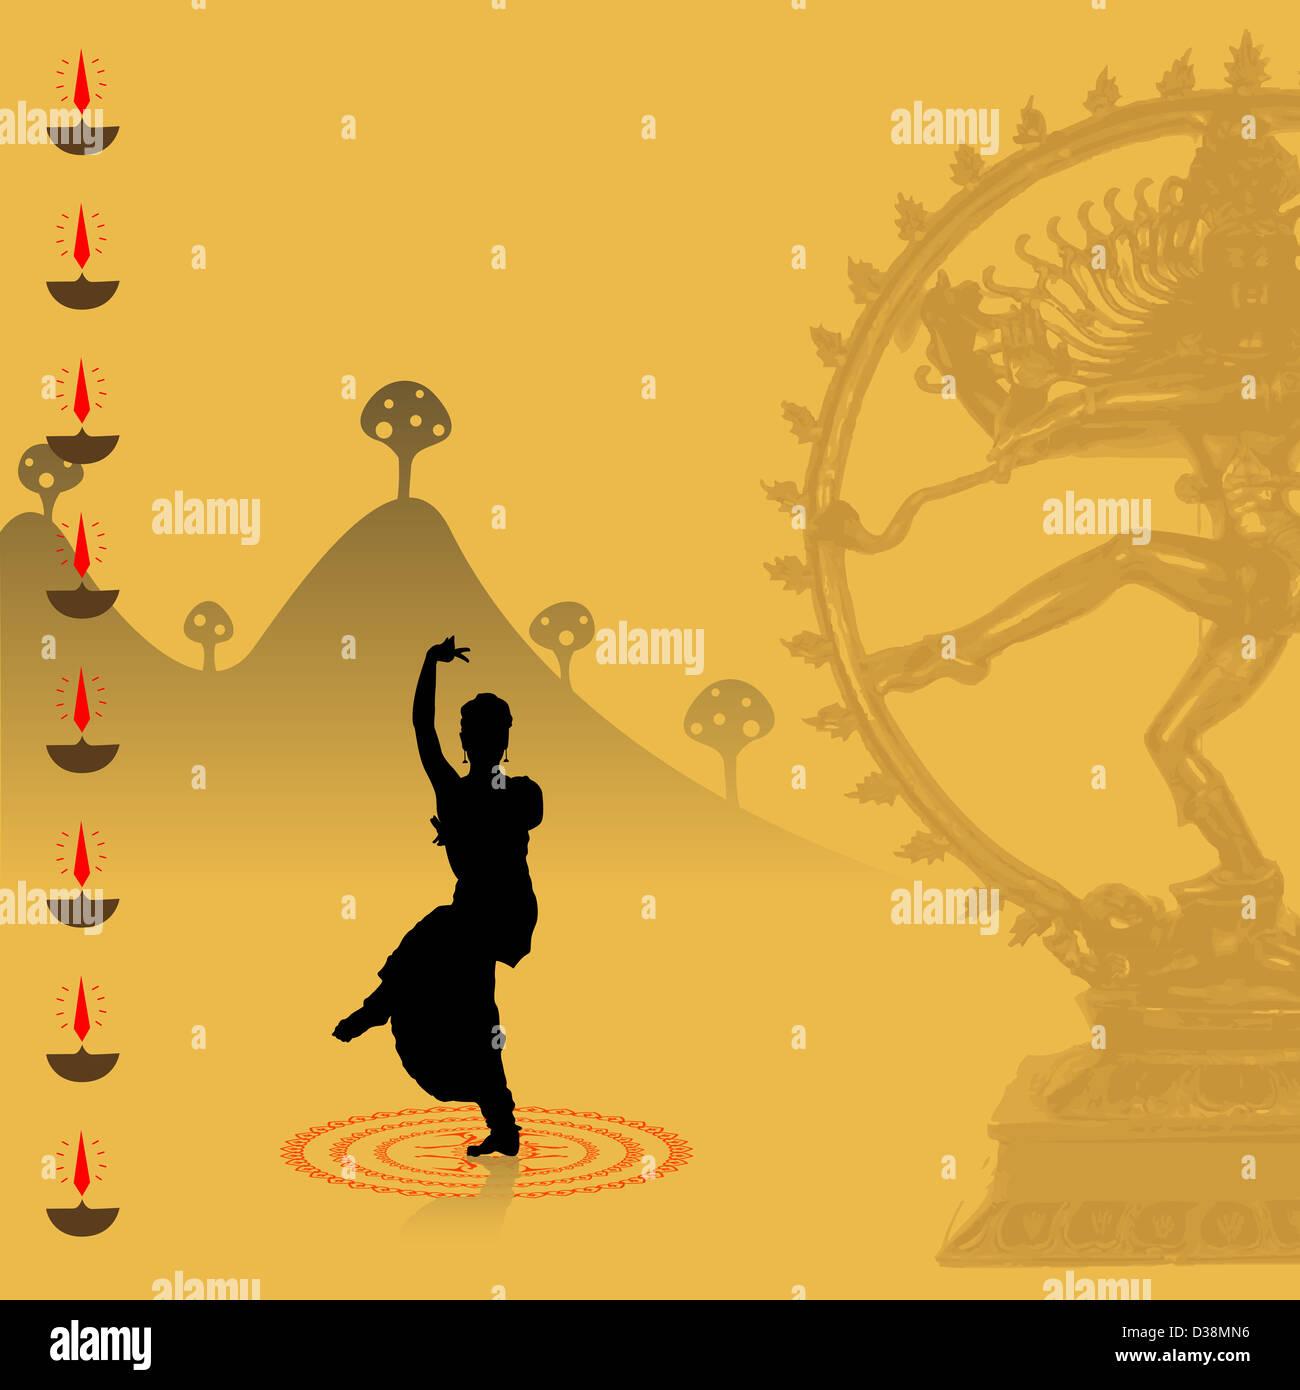 Bharatanatyam Dance Dress High Resolution Stock Photography And Images Alamy